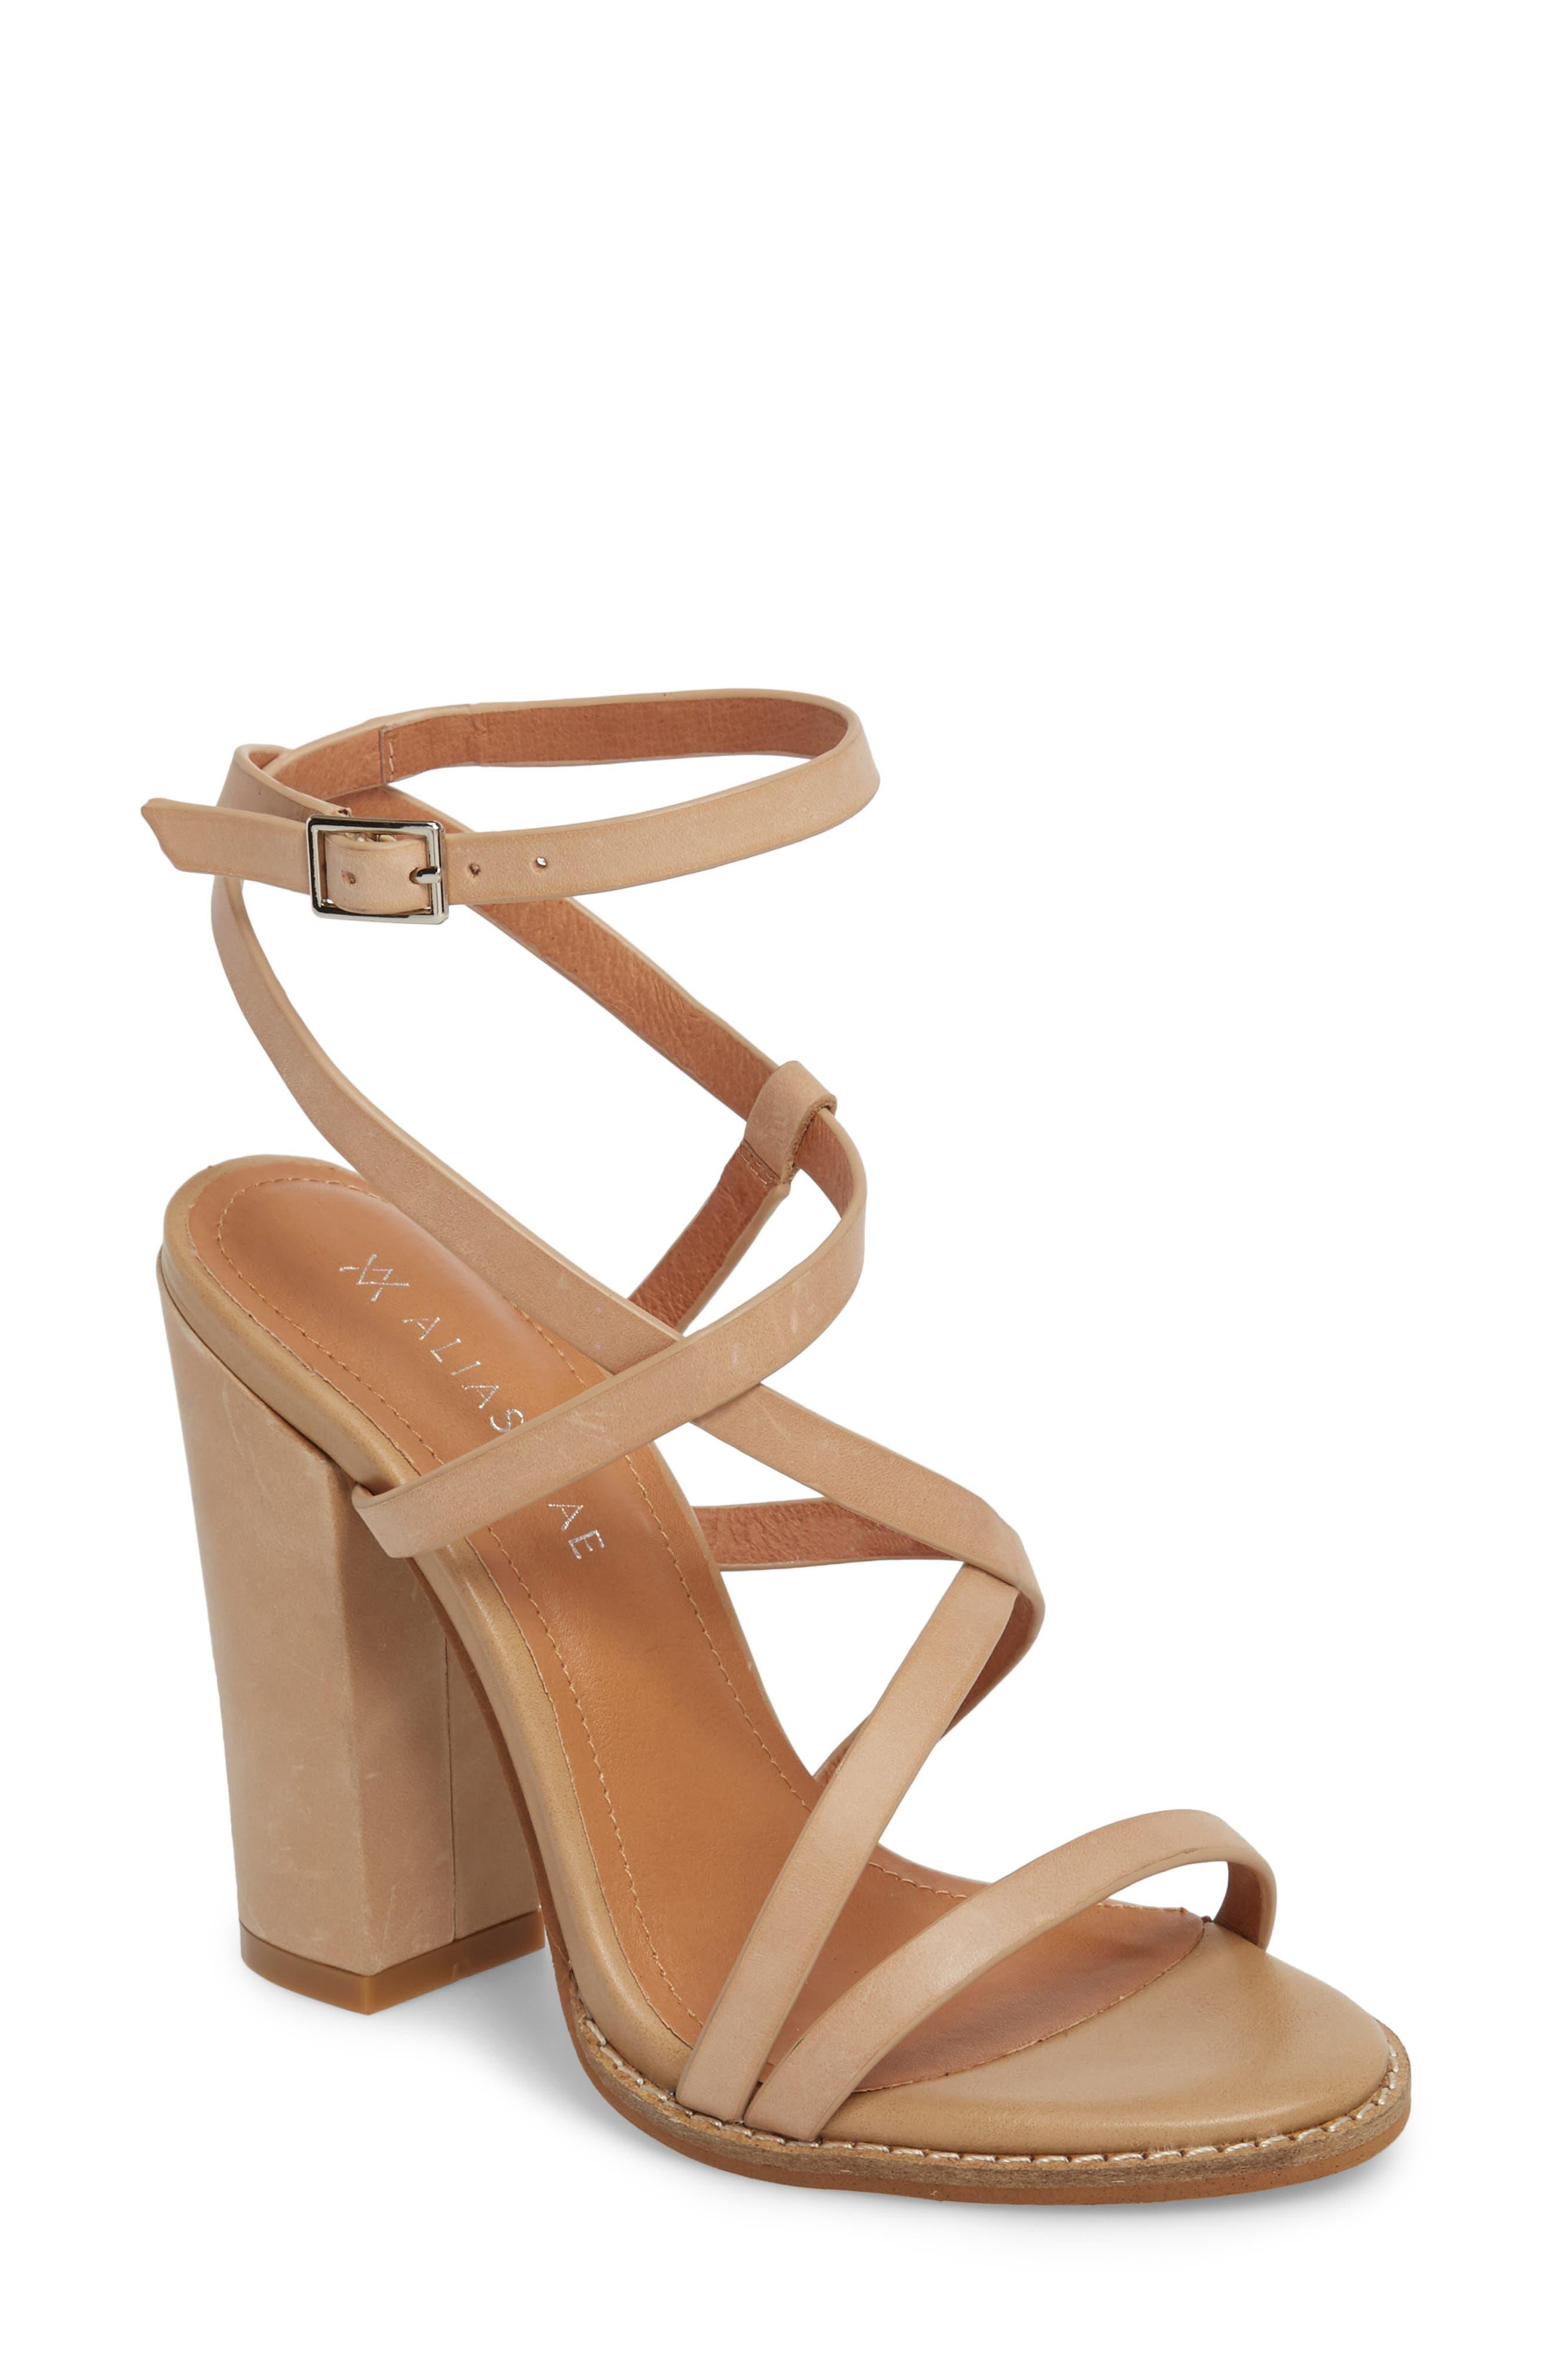 Jyve Asymmetrical Cross Strap Sandal,                             Main thumbnail 1, color,